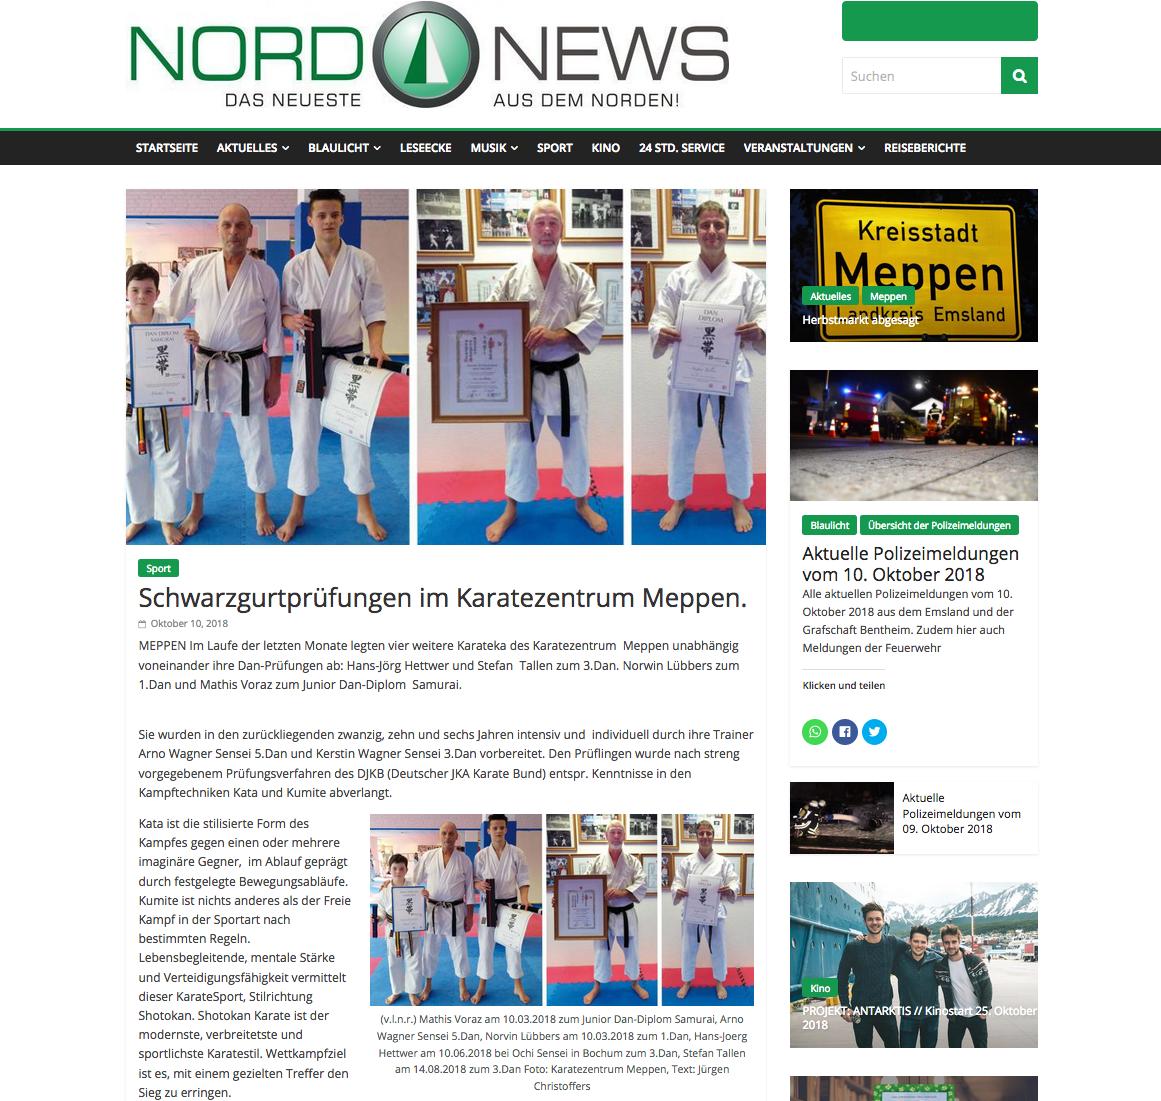 Danprüfungen Meppen 2018, NordNews-Online am 10.10.2018